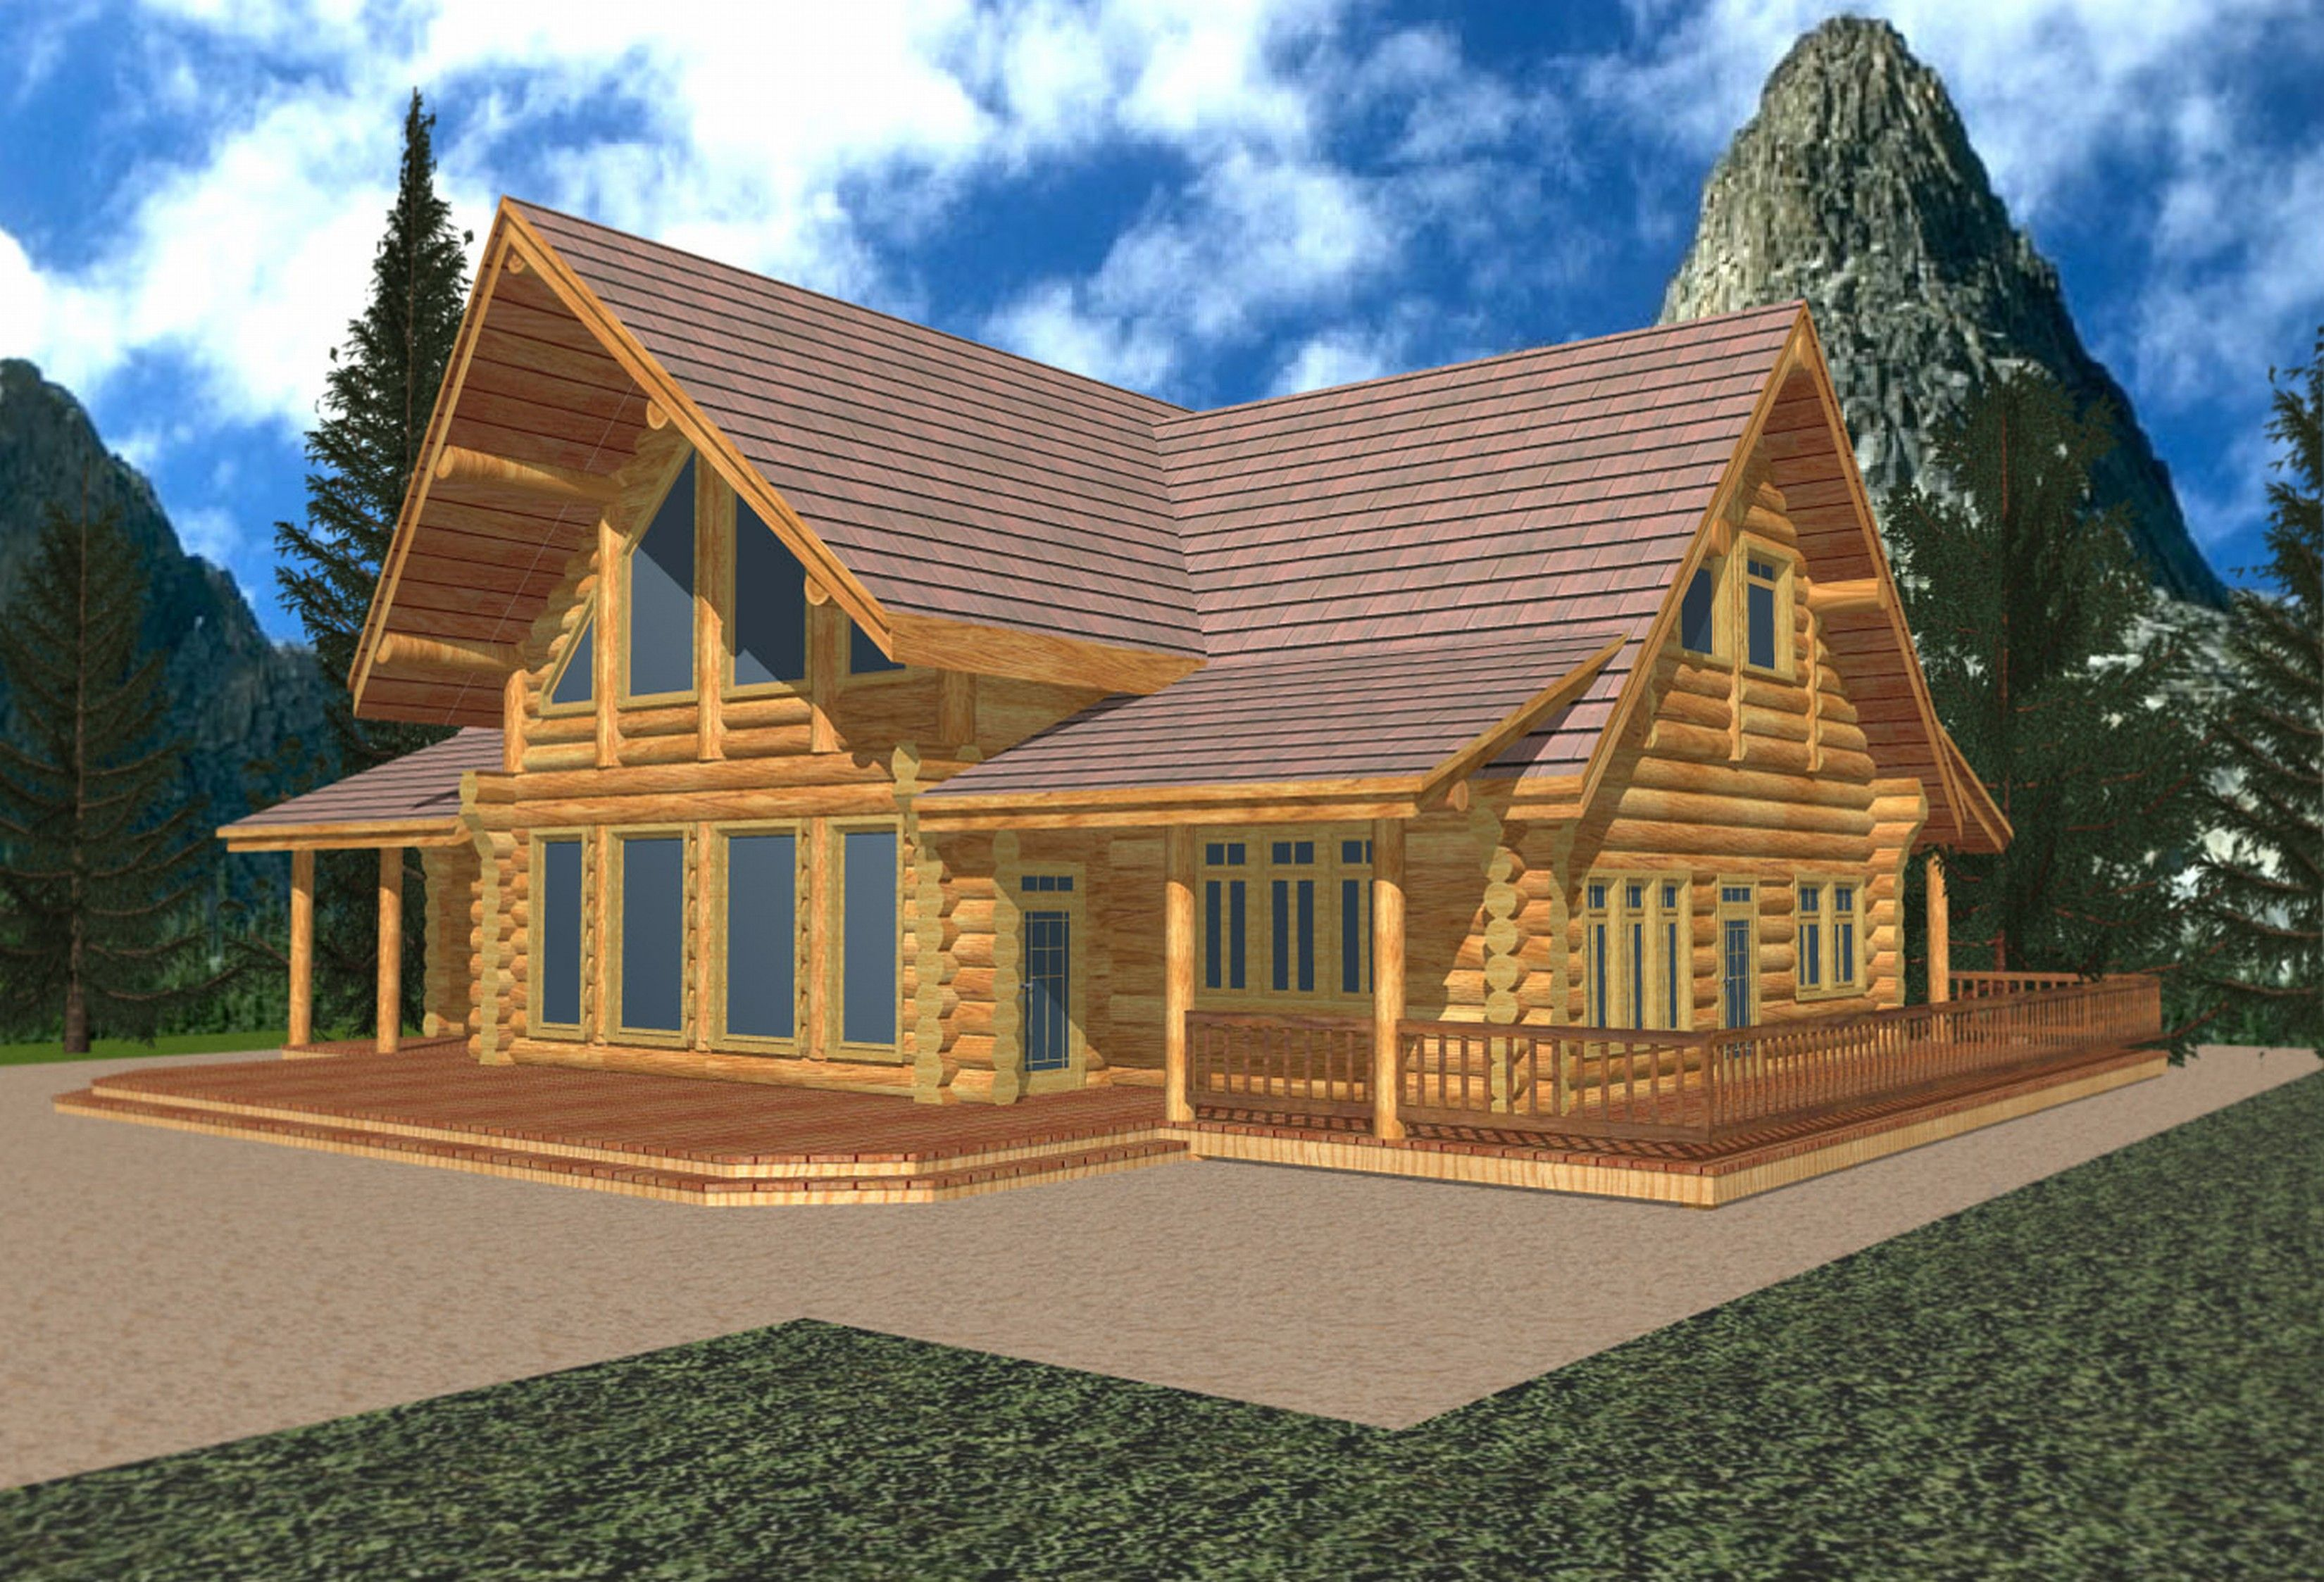 2680 Sq Ft Classic Whistler Log Design Coast Mountain Log Homes Log Cabin House Plans Cabin House Plans Log Home Plans